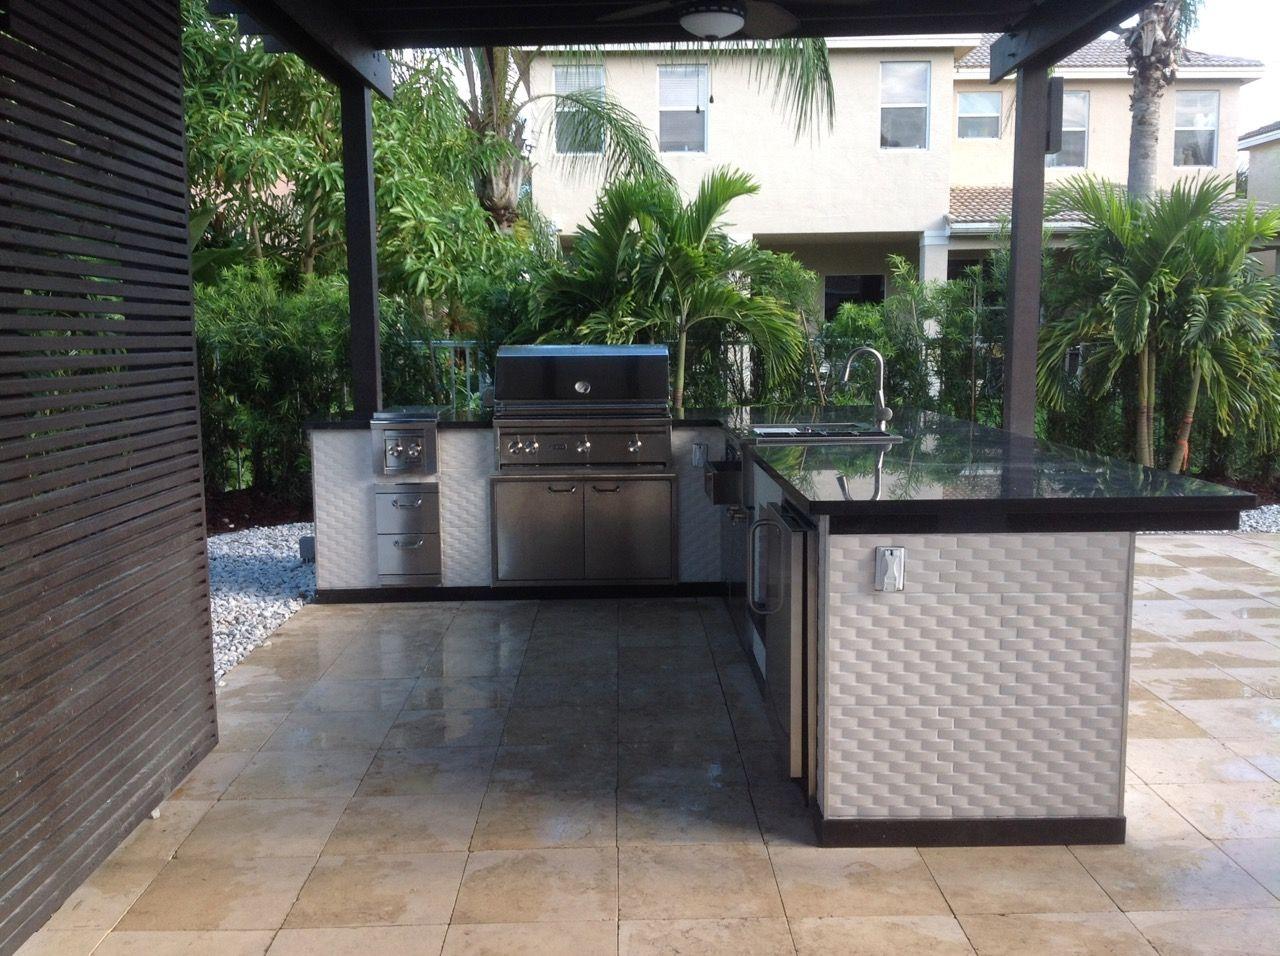 Outdoor Kitchens Luxapatio Outdoor Kitchen Outdoor Kitchen Appliances Patio Remodel